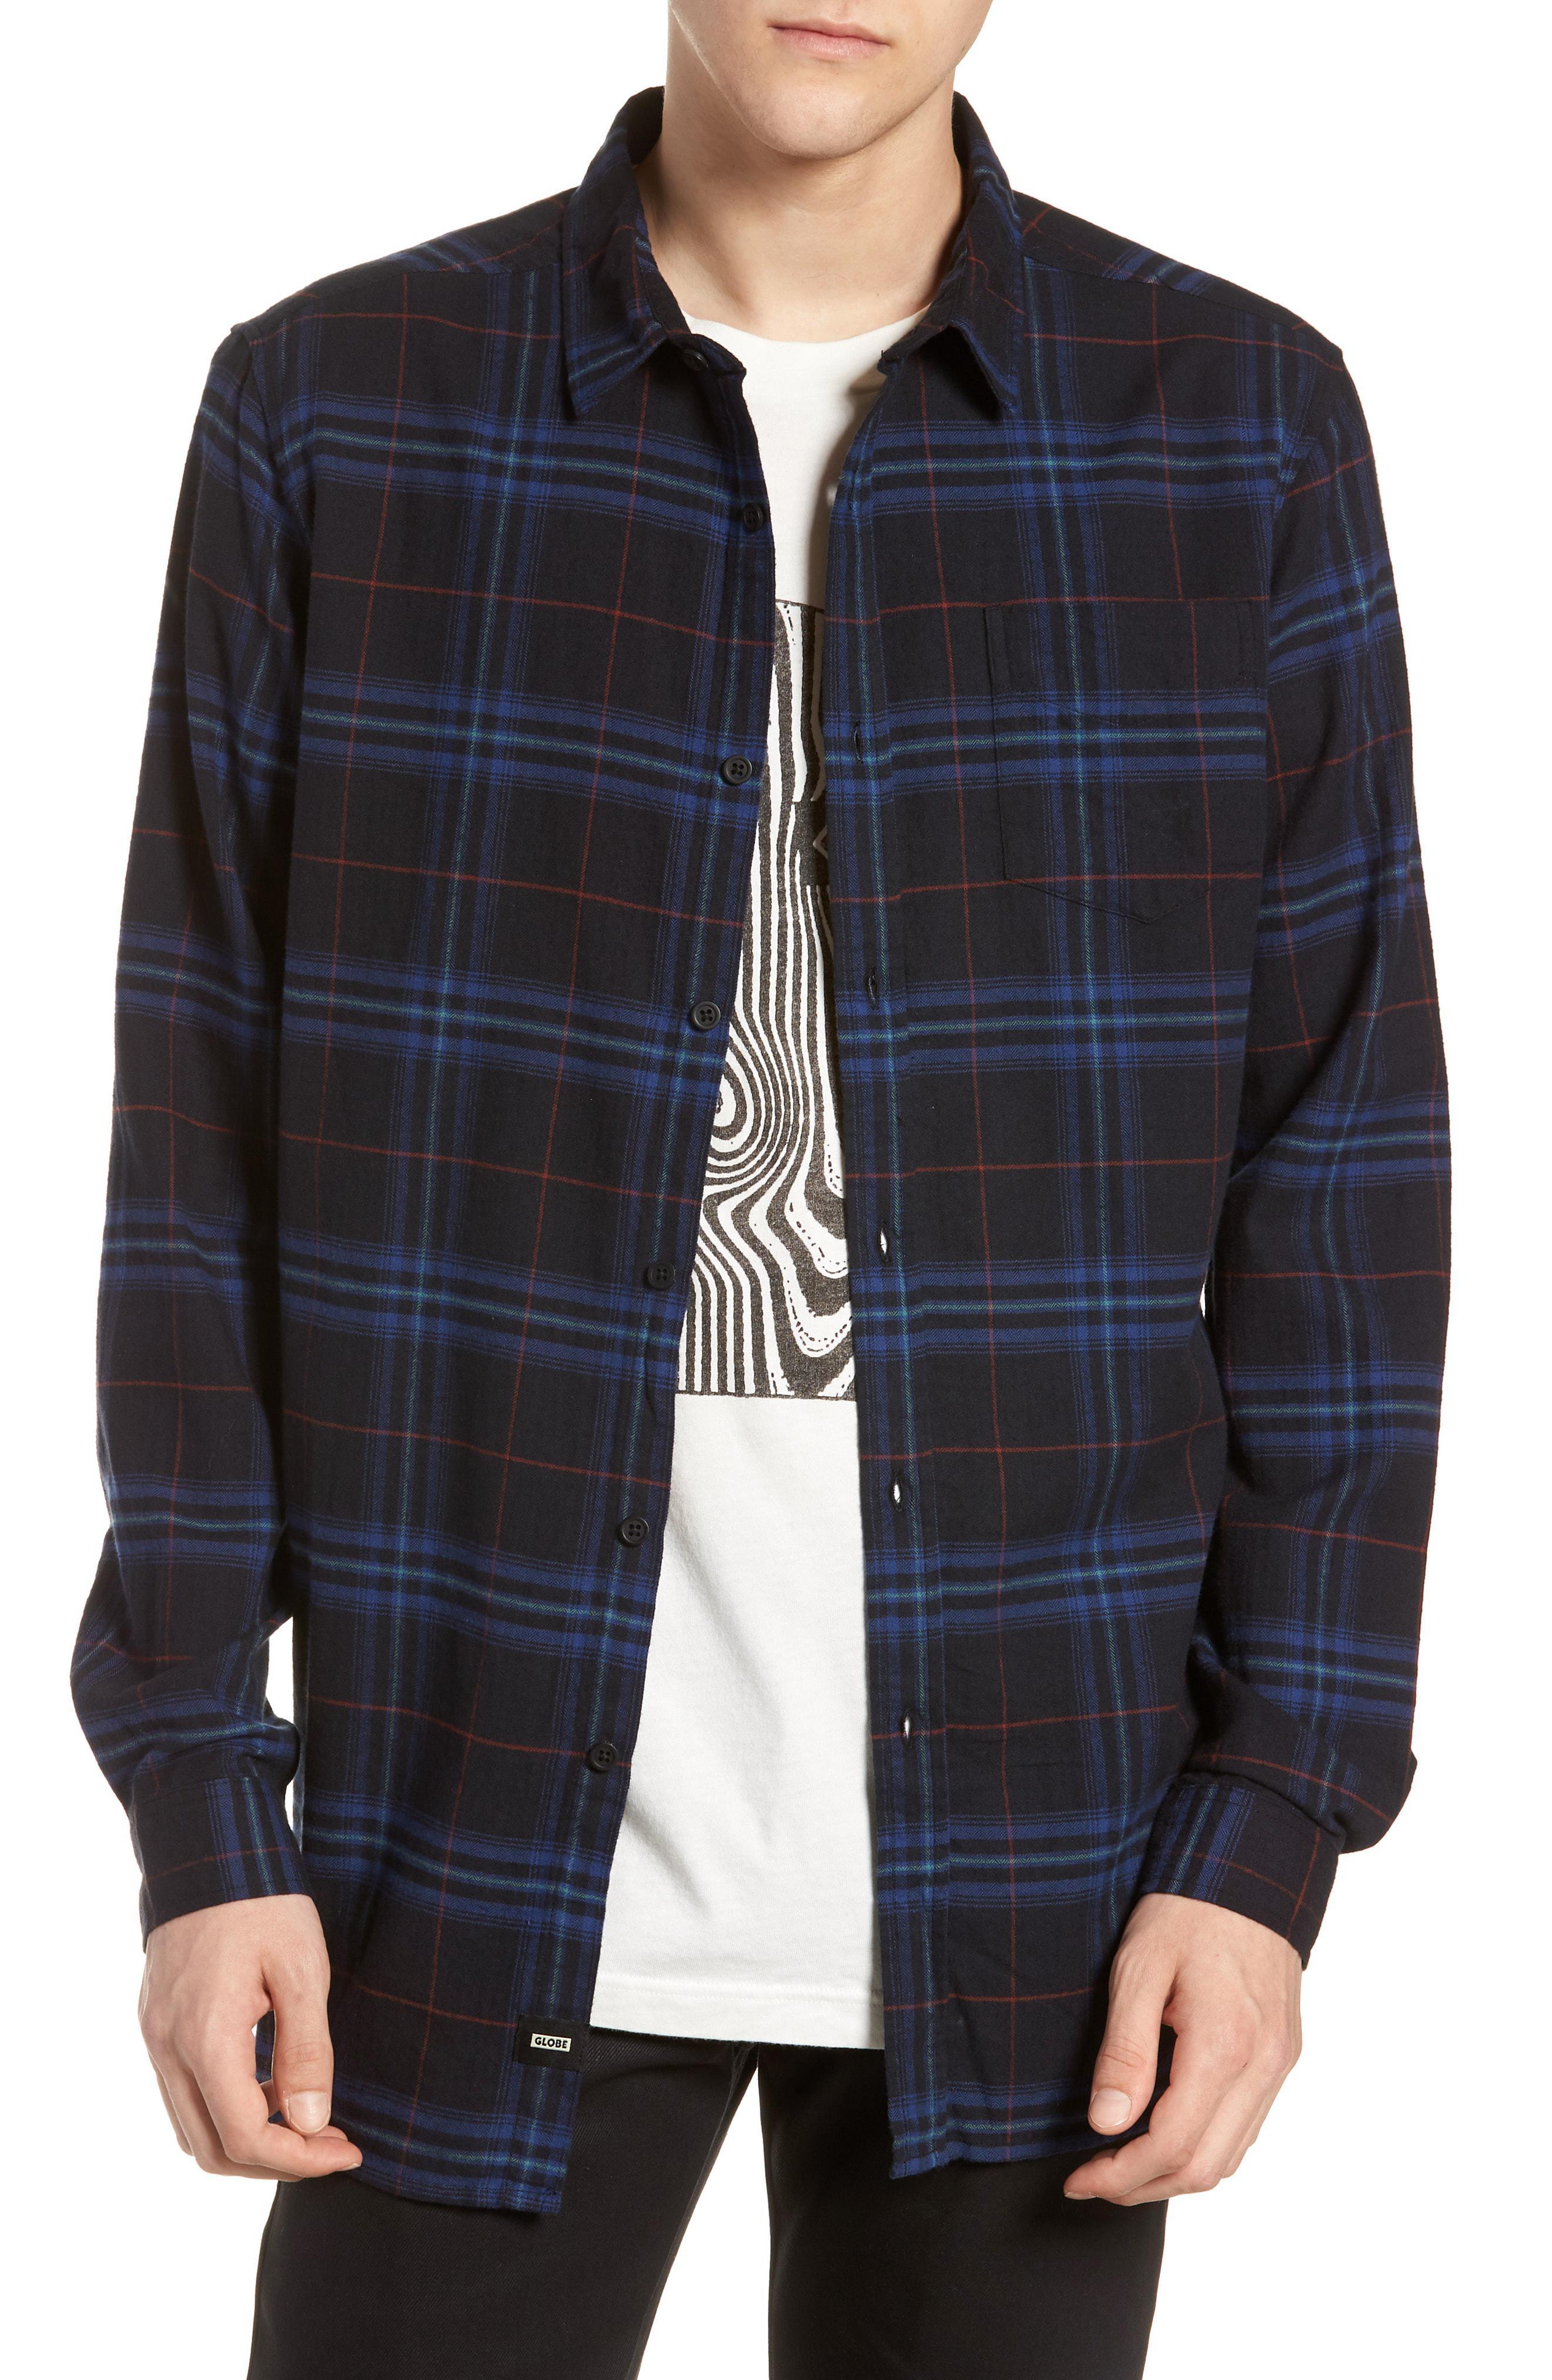 e47a1651b7ac Globe Dock Plaid Shirt in Blue for Men - Lyst